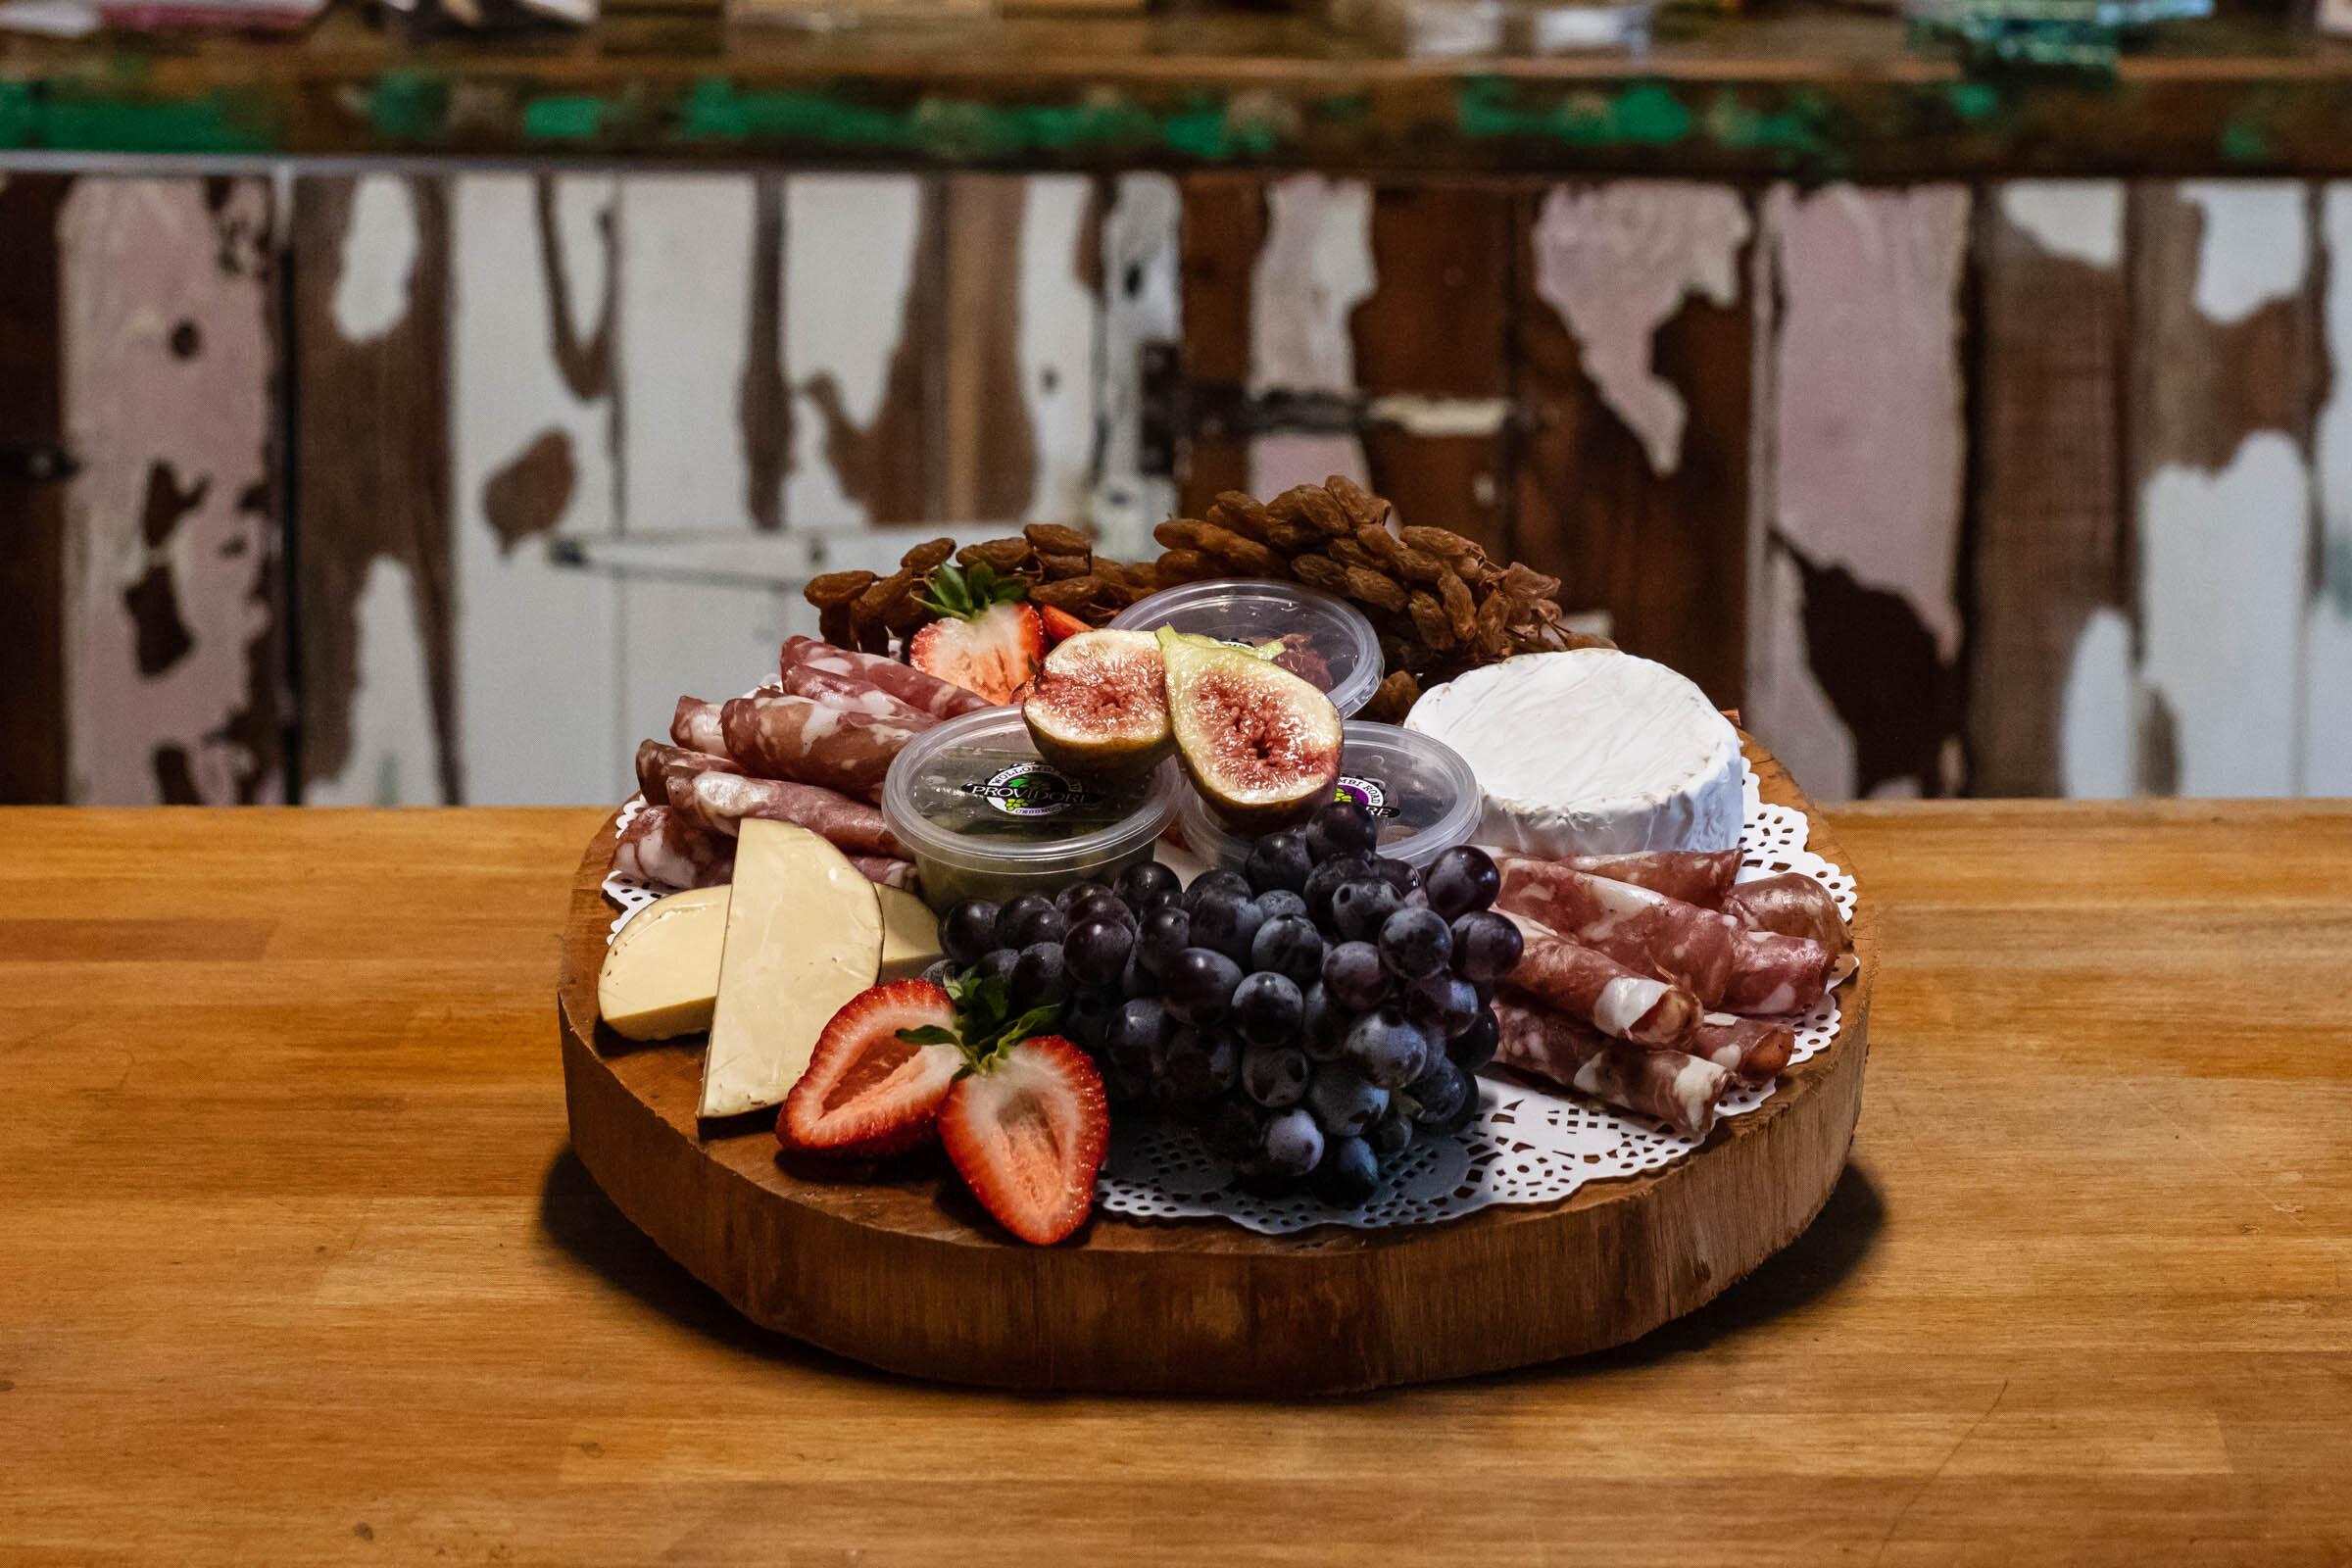 Small Cheese Platter 2 4 People Wollombi Road Providore